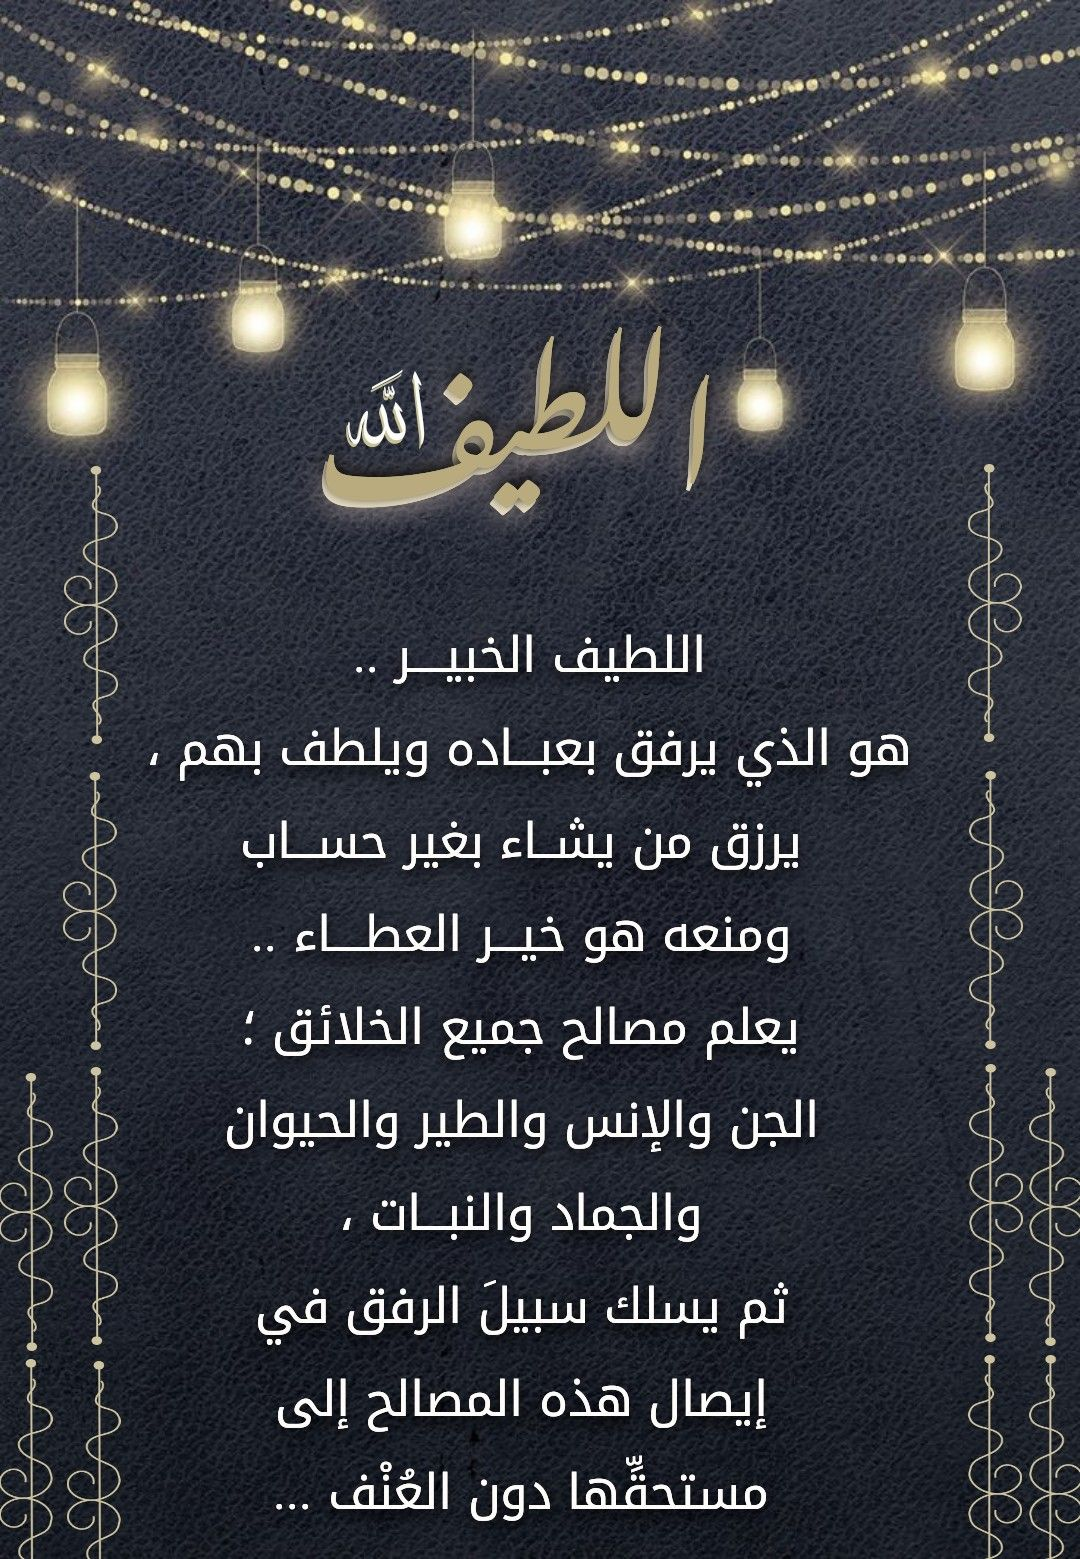 اسم الله اللطيف Allah I Pay Names